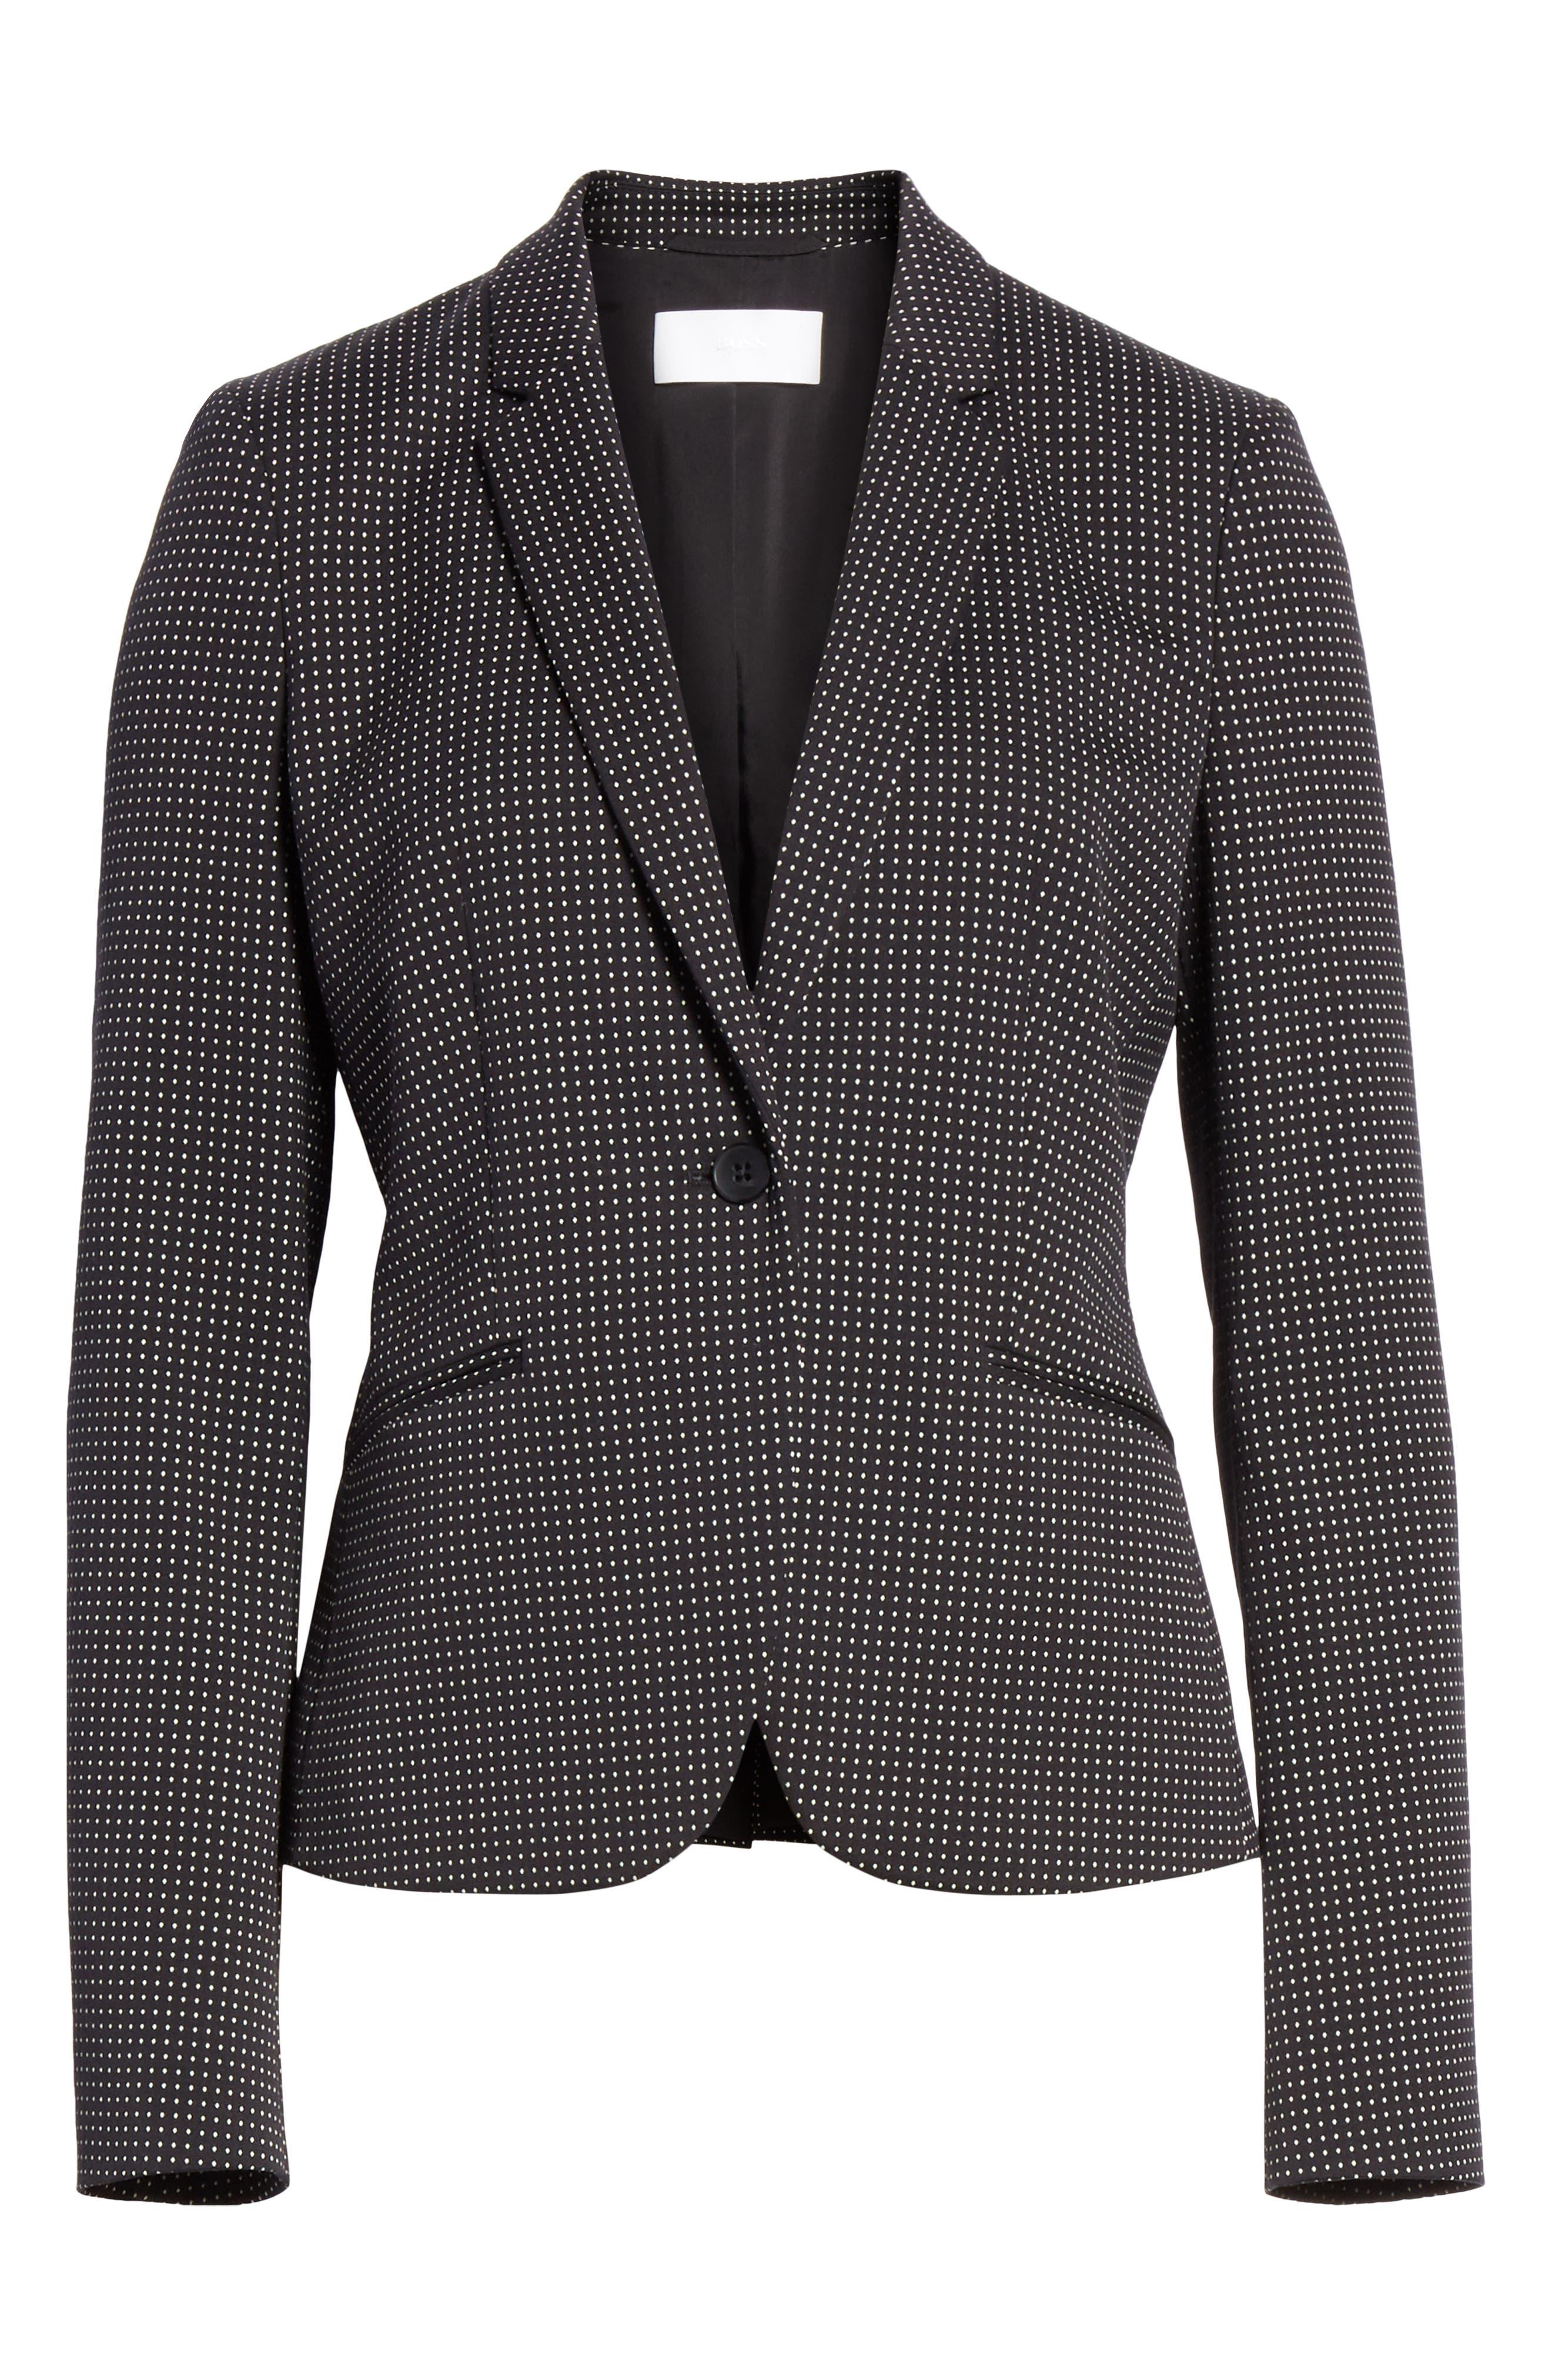 Jumano Dot Stretch Jacket,                             Alternate thumbnail 5, color,                             BLACK FANTASY